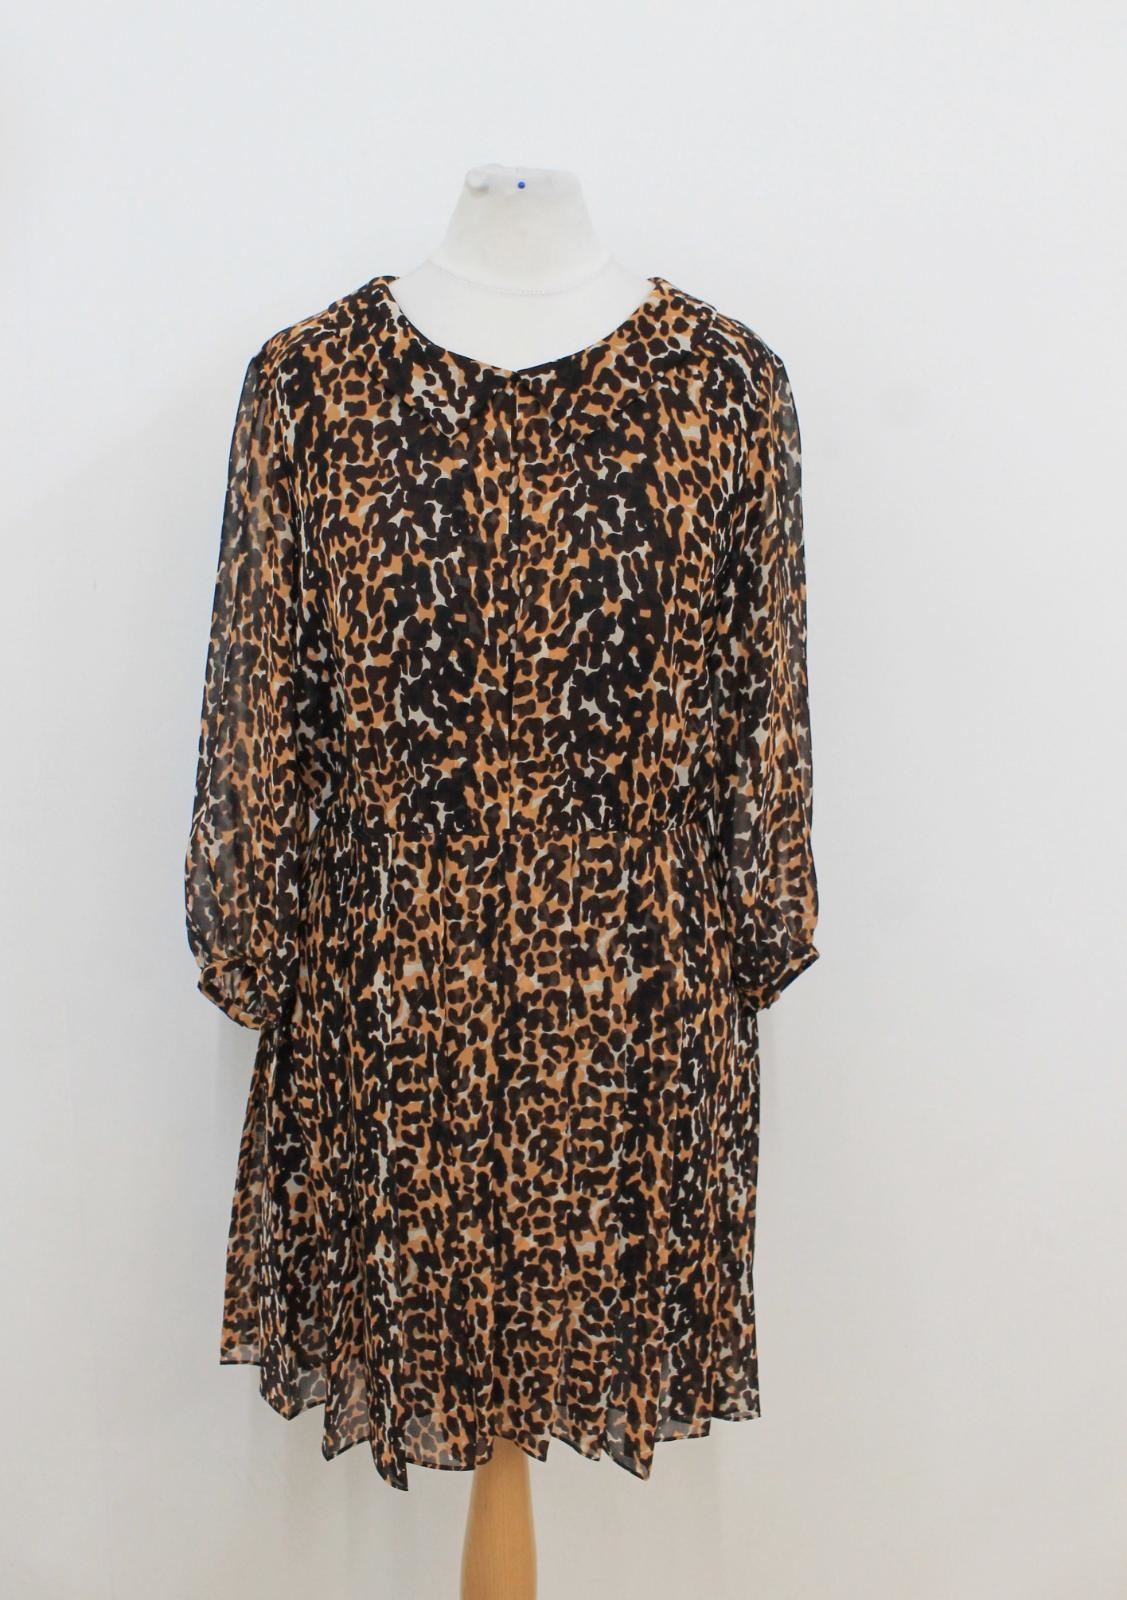 WHISTLES-Ladies-Brown-Black-Animal-Print-Long-Sleeved-Pleated-Dress-Size-UK8